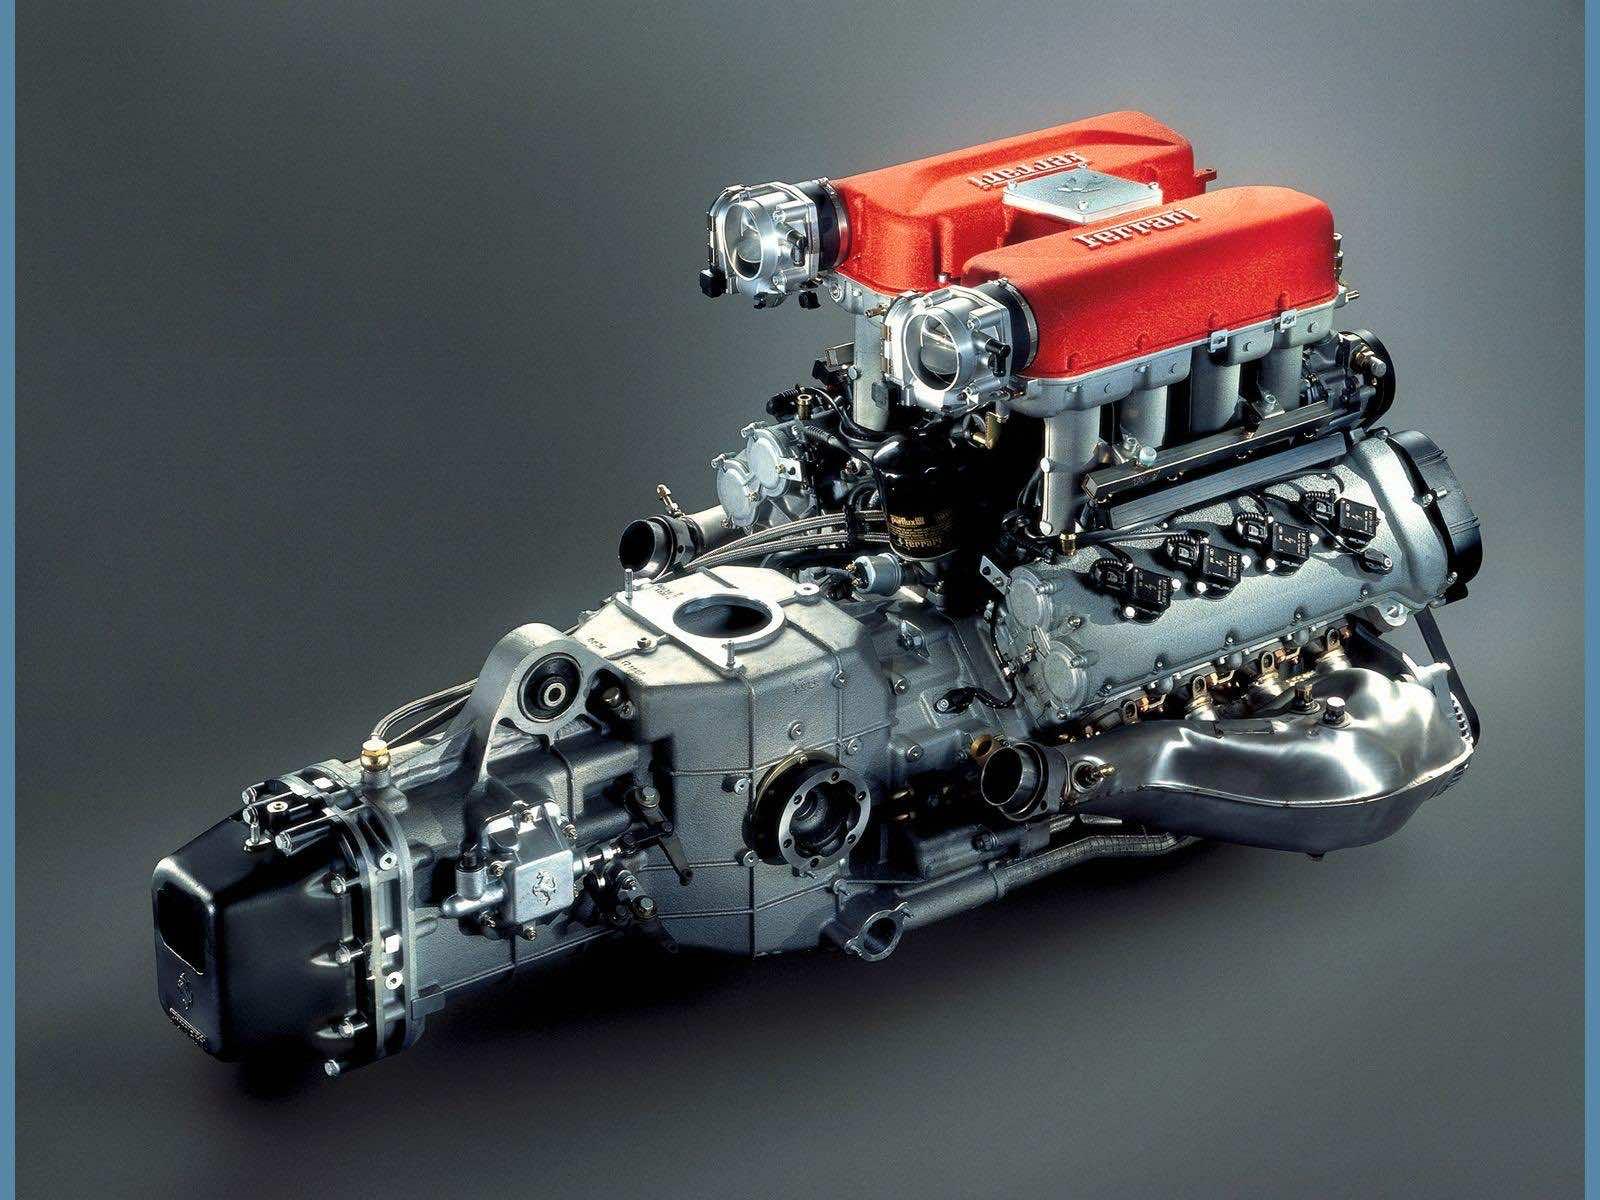 Wallpaper Engine 2021